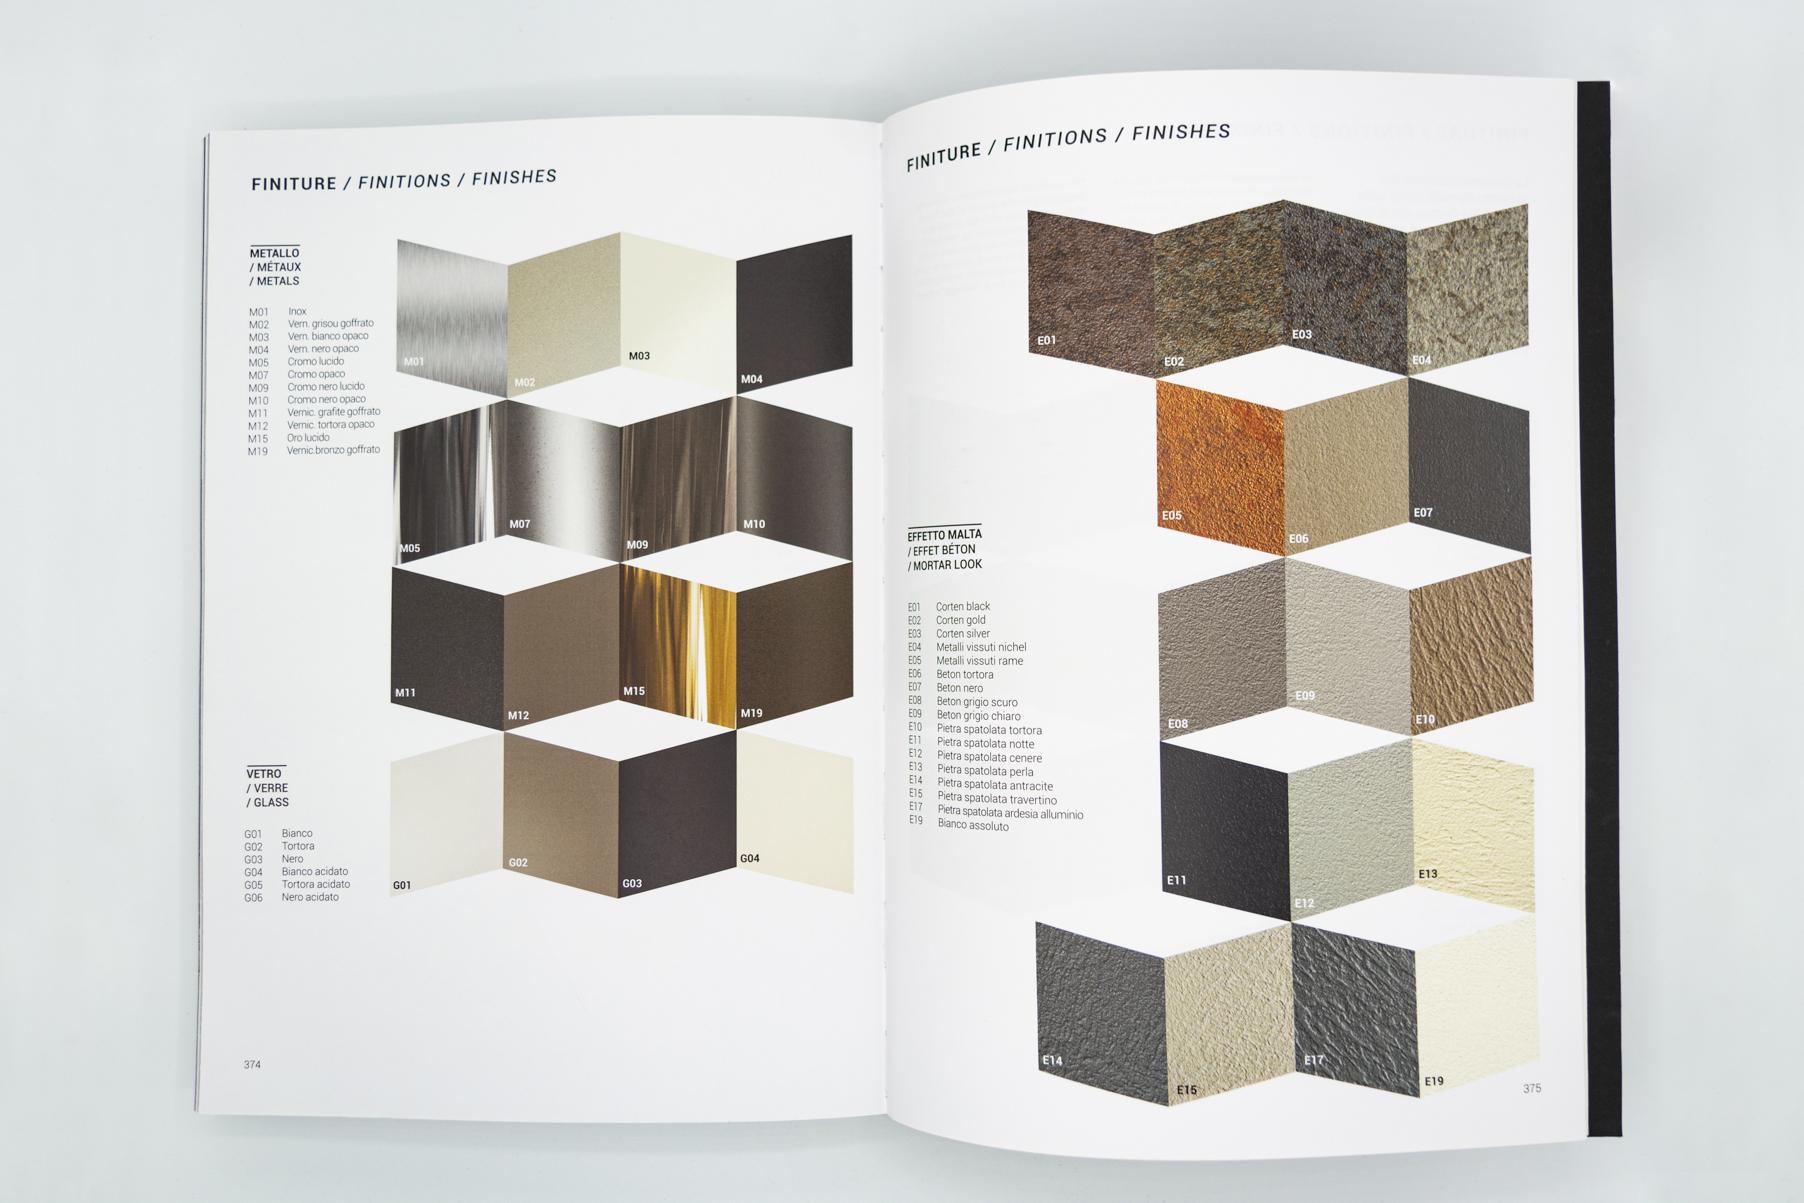 altacom-tavoli-design-materiali-pagina-tecnica